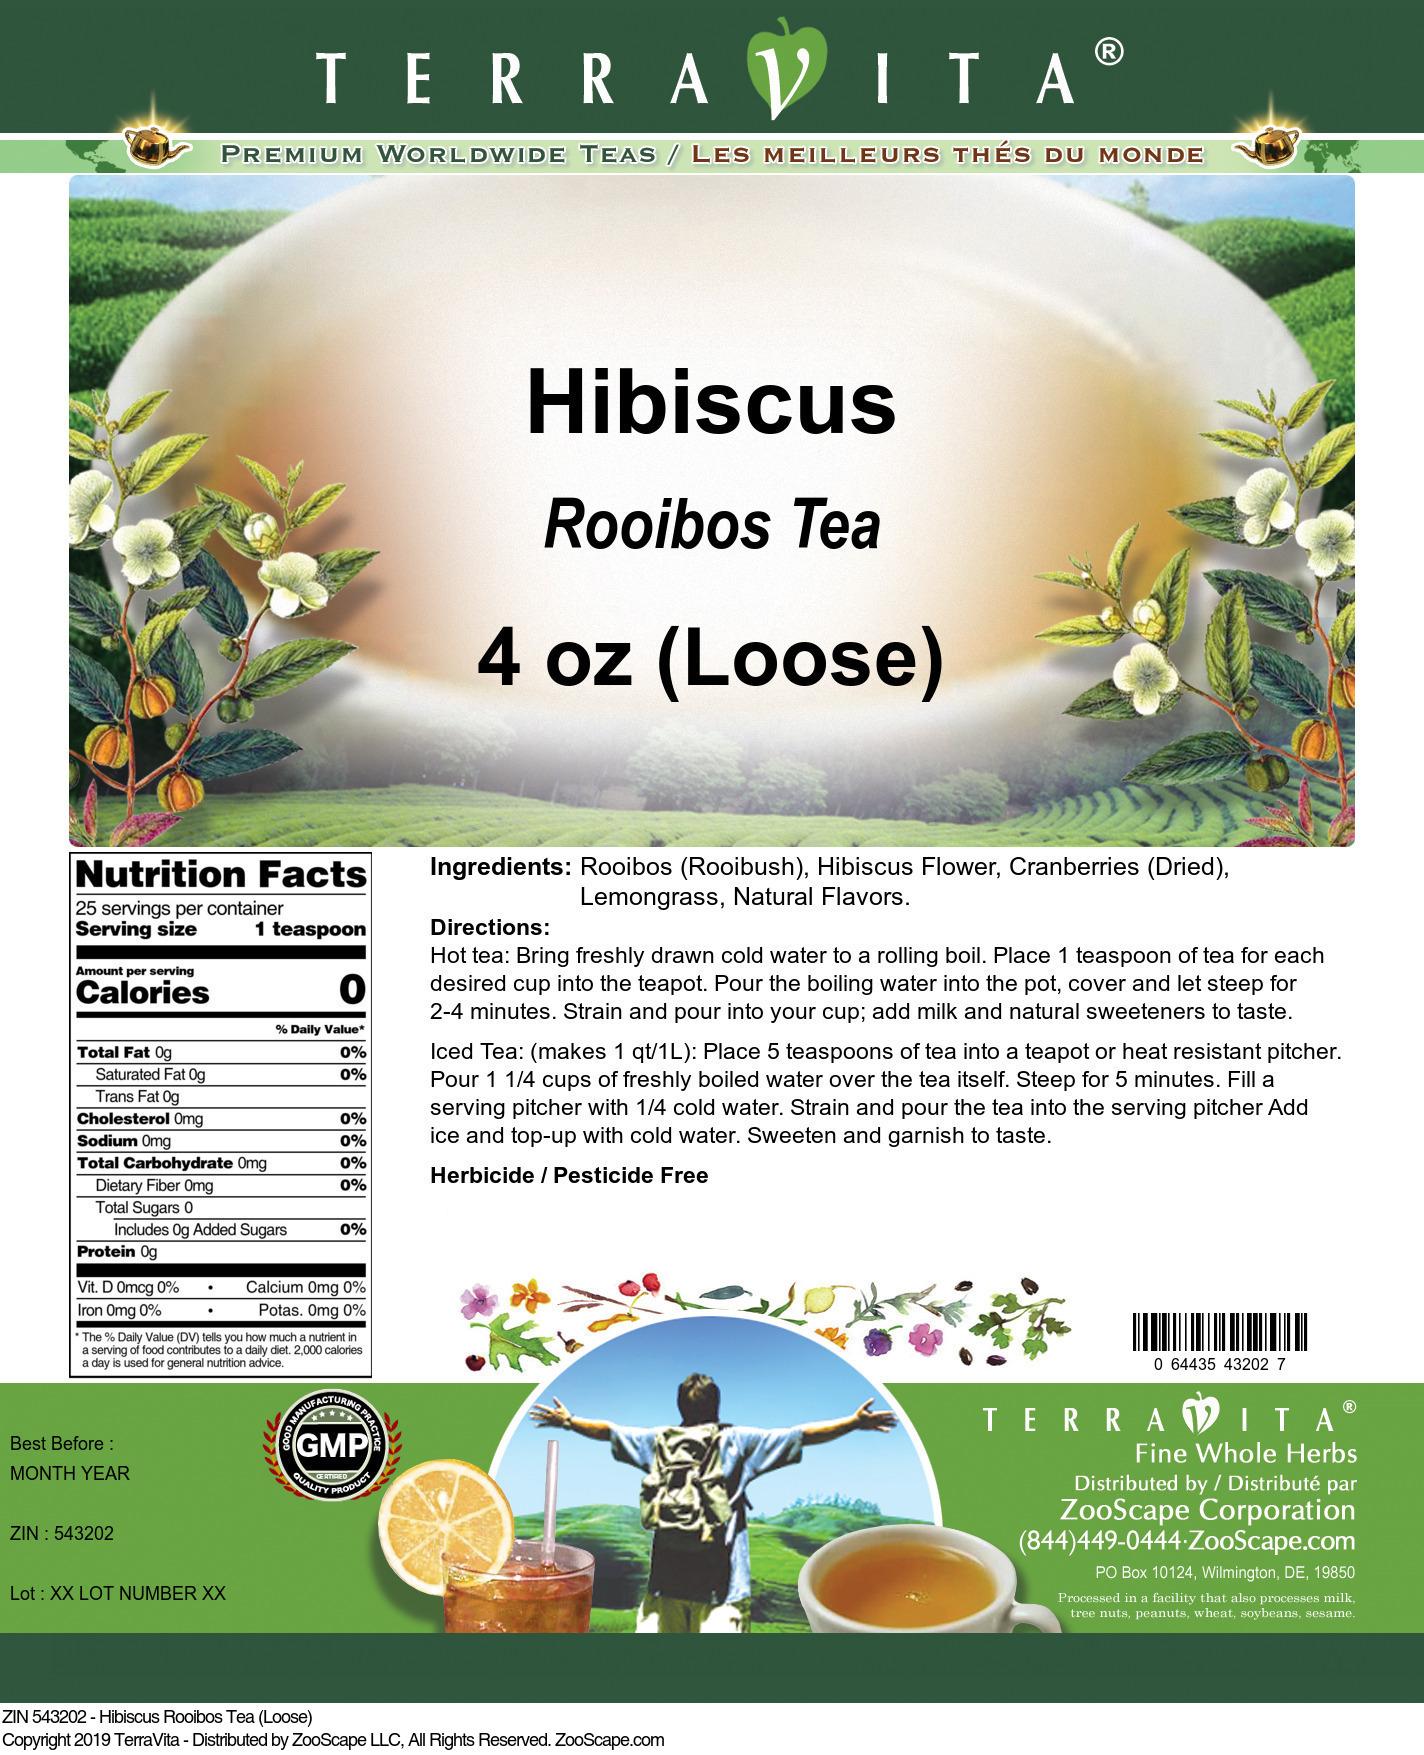 Hibiscus Rooibos Tea